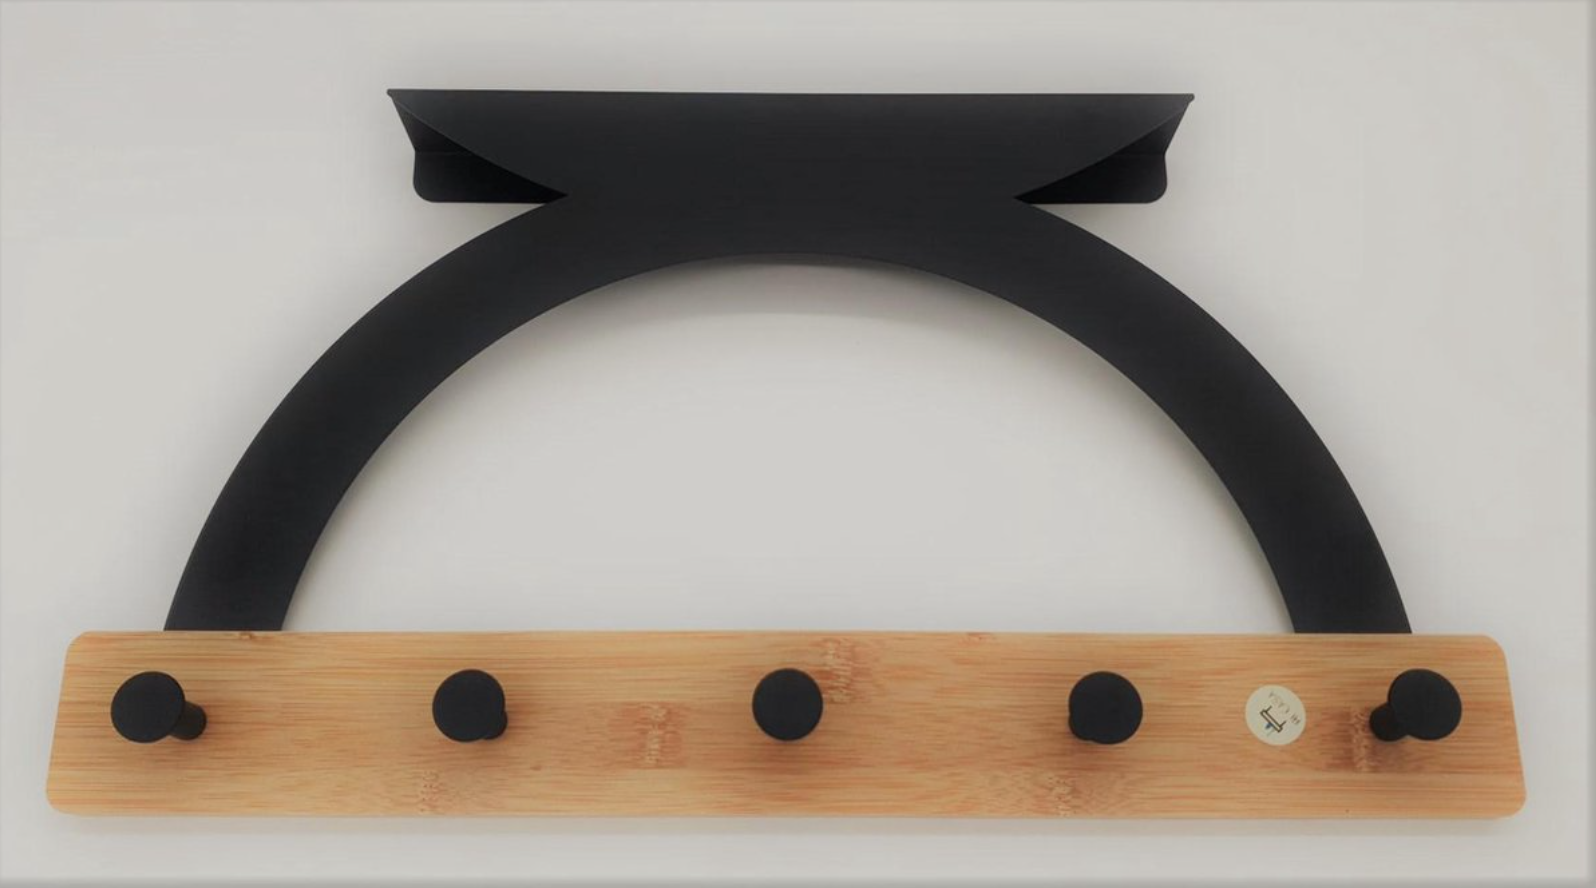 Zwarte deurkapstok van bamboe en metaal